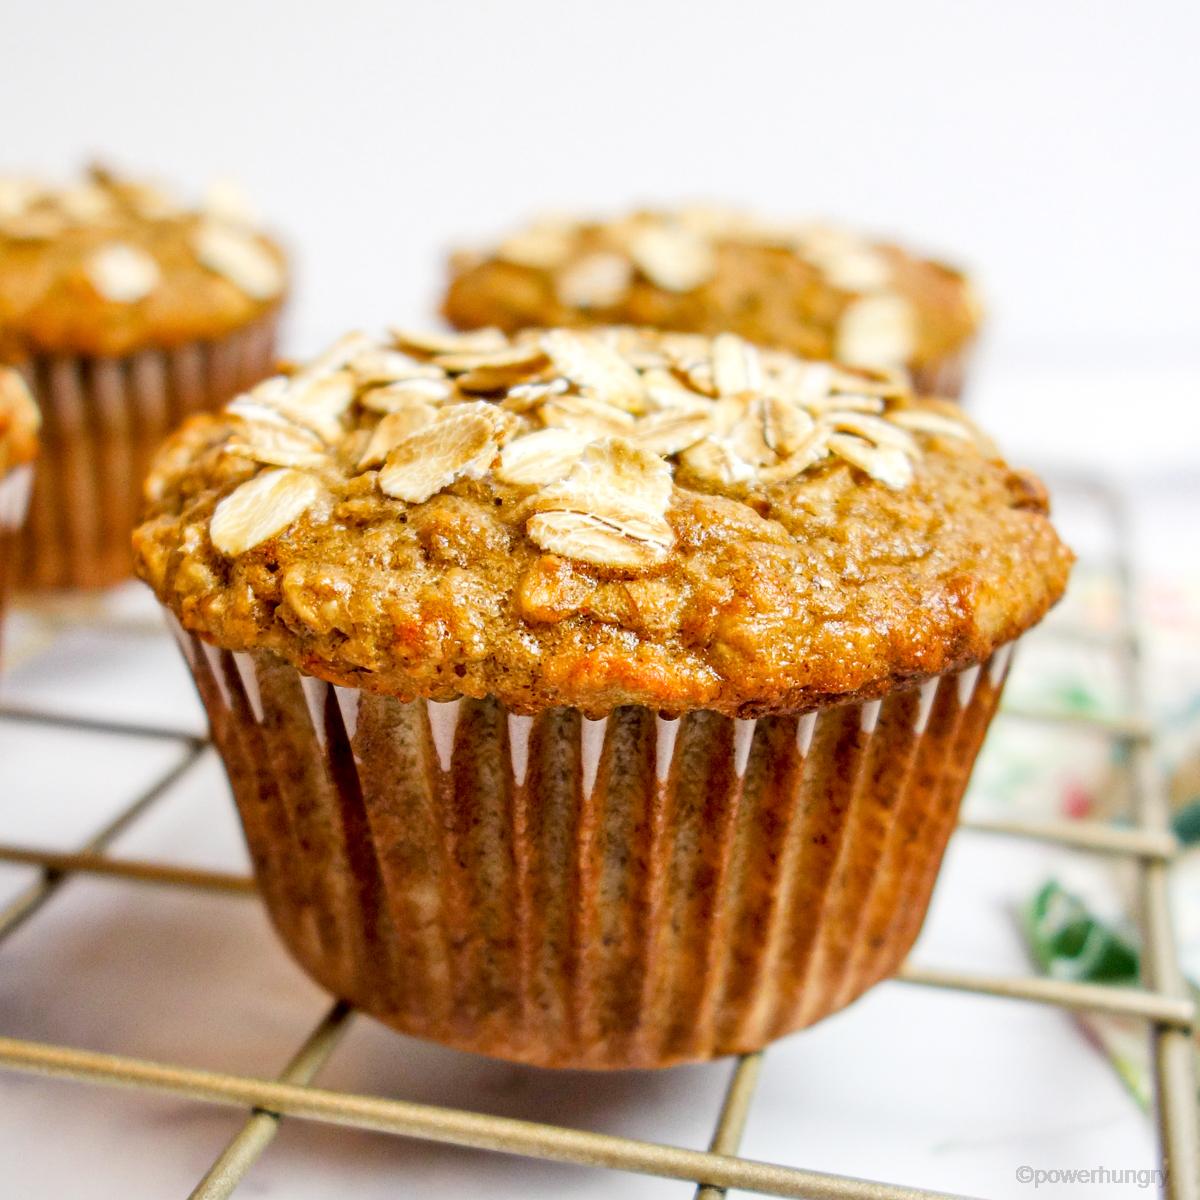 Vegan Peanut Butter Banana Oat Muffins (oil-free, GF)